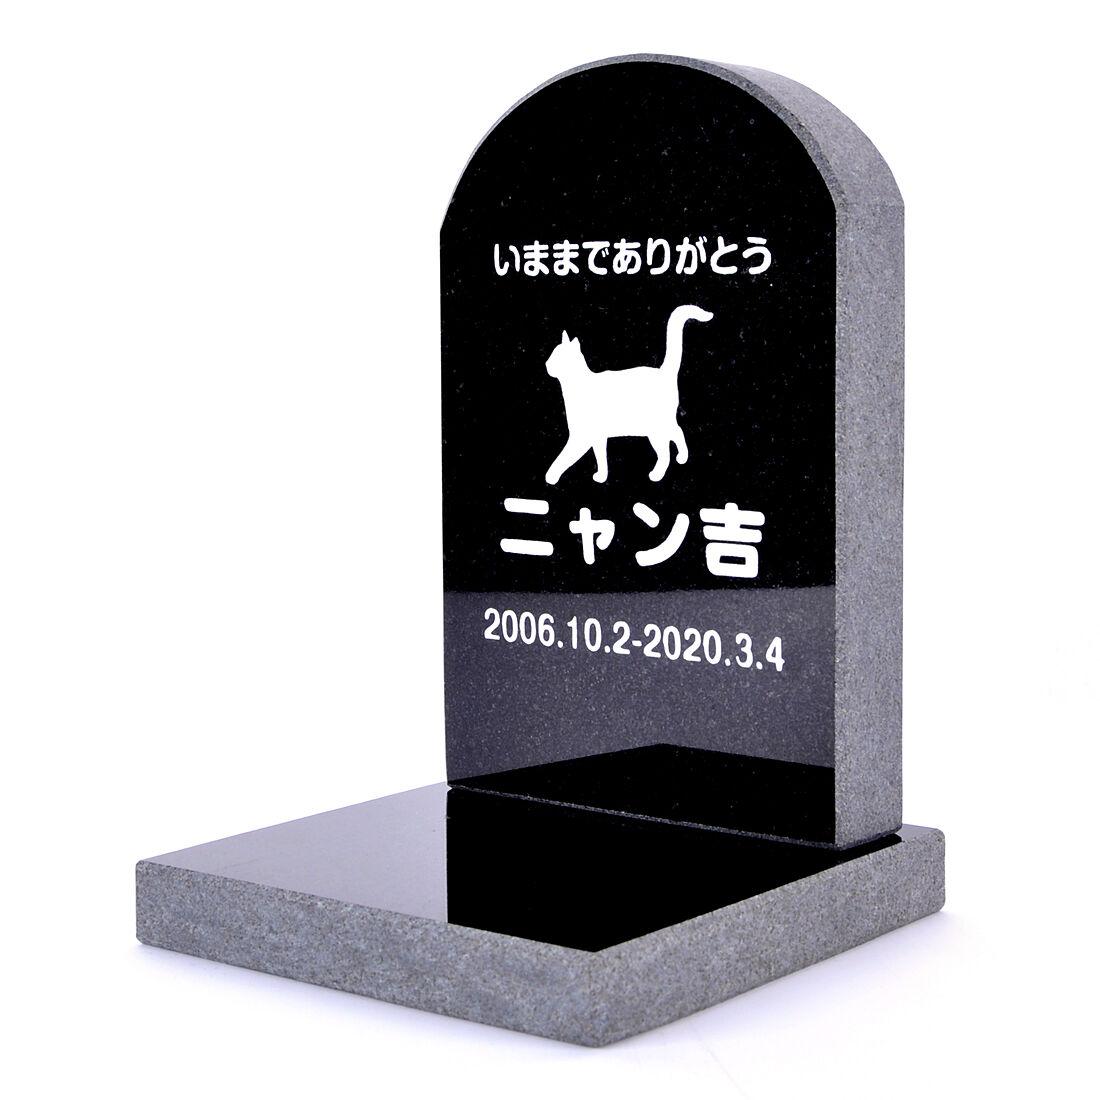 Pet&Love. ペットのお墓 天然石製 セット型 御影石 ブラック スタンダード 小型 猫用 【HLS_DU】【_名入れ】 attr131attr ctgr2ctgr sml3sml+ctgr2ctgr CAT